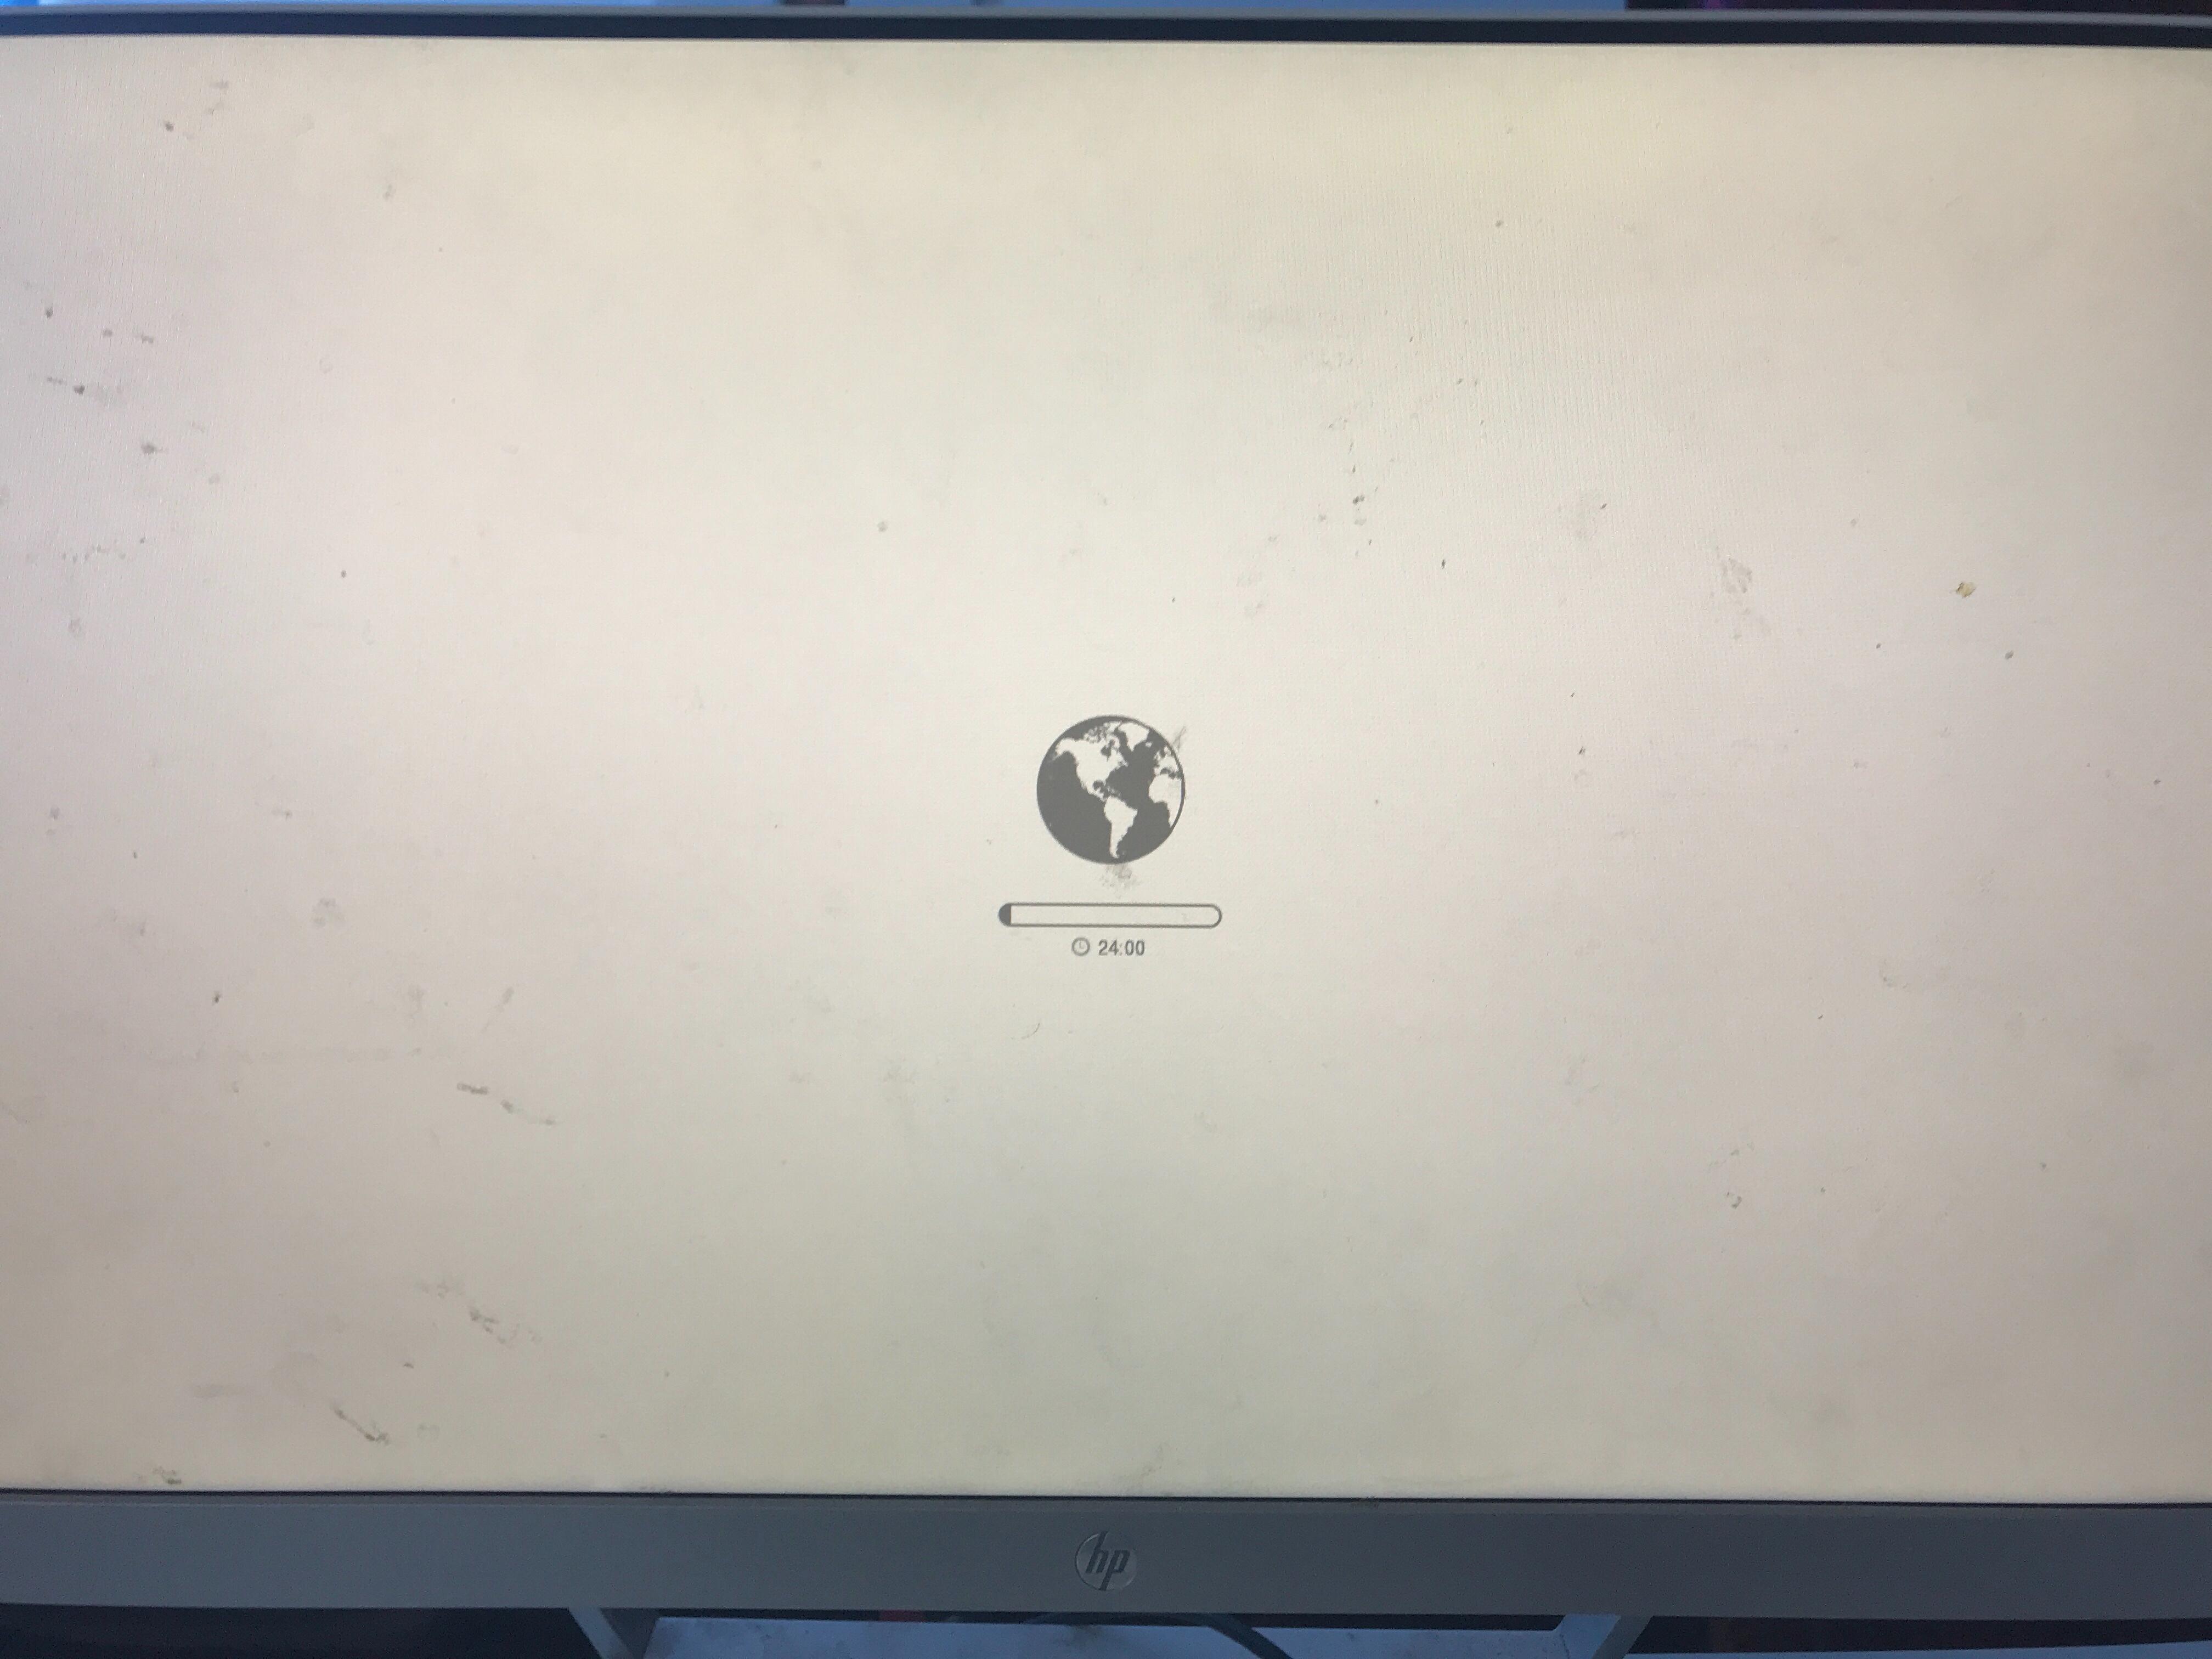 iMac Internet recovery stuck, says 24:00 … - Apple Community